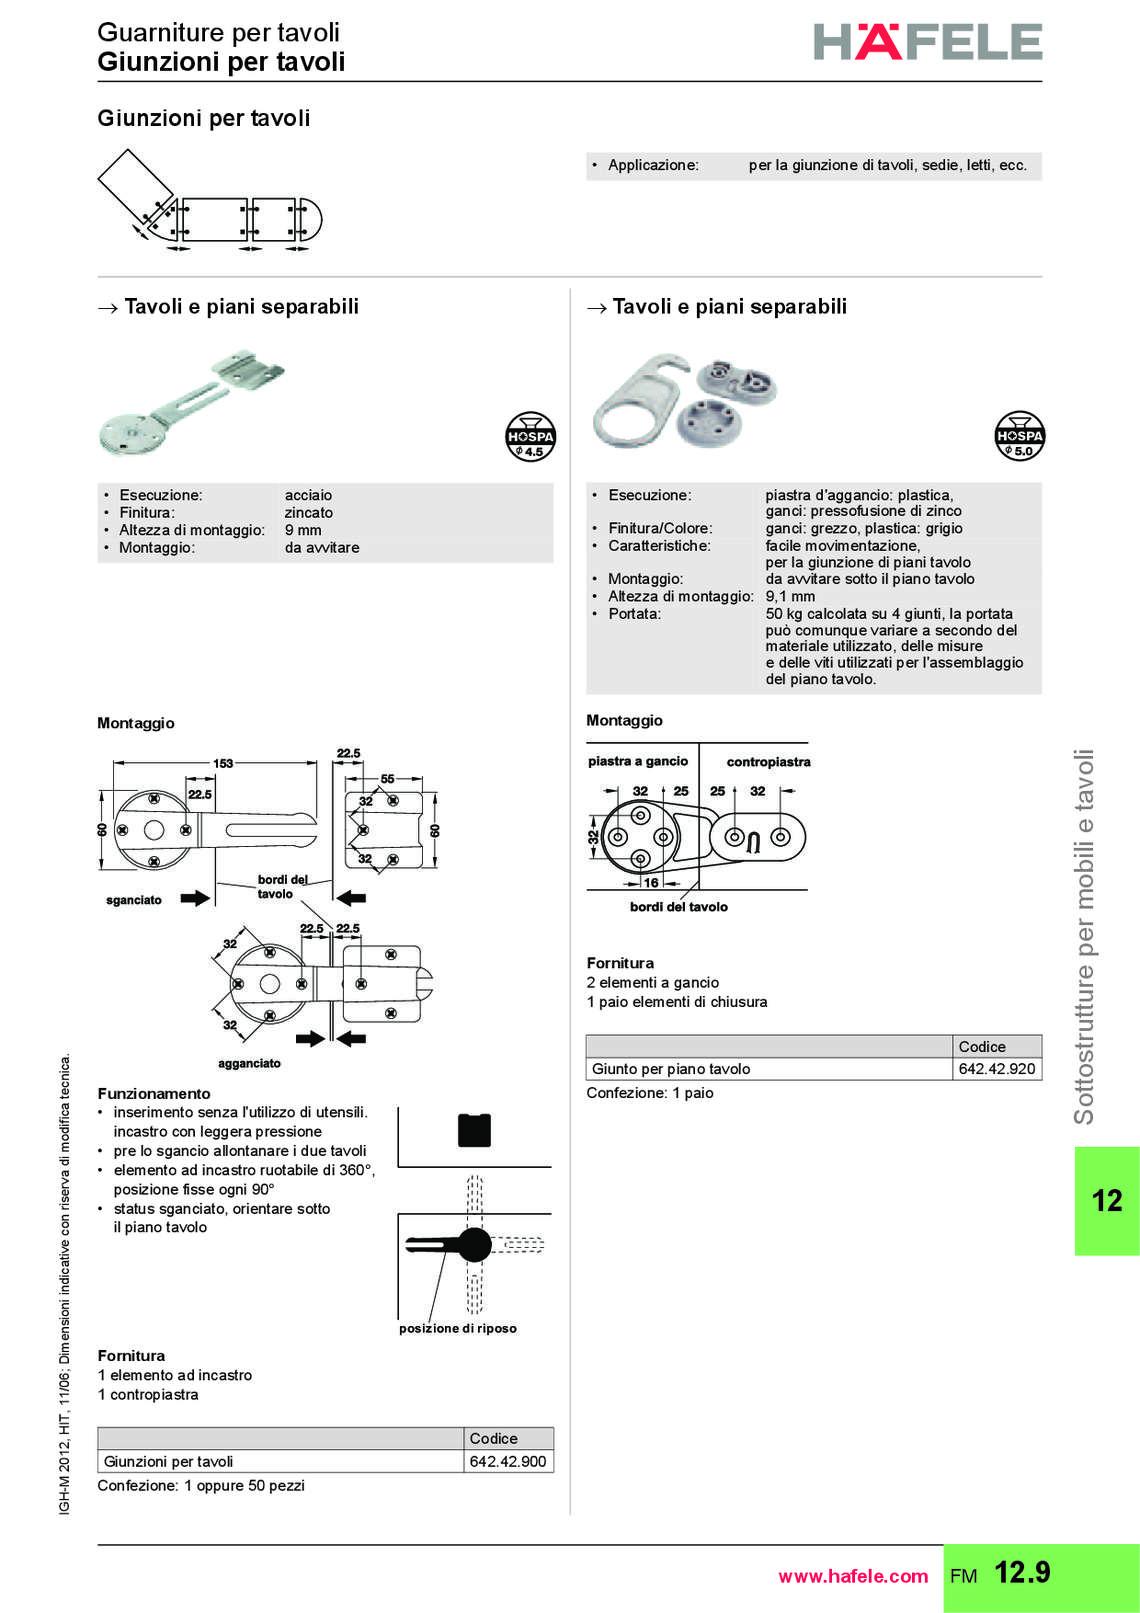 hafele-sottostrutture-per-mobili_83_018.jpg